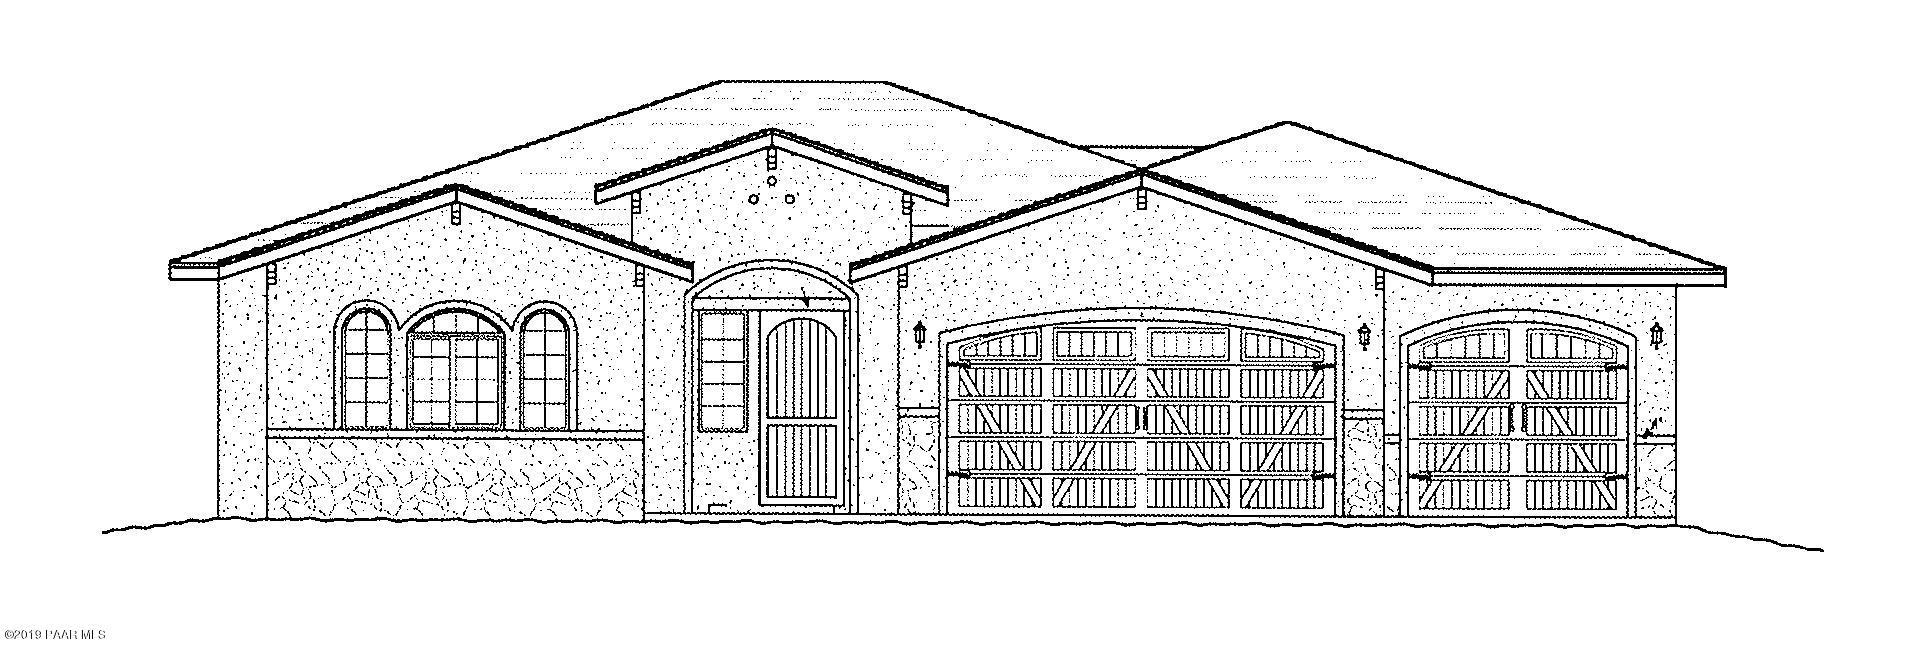 7066  Windy Walk Way, Prescott Valley in Yavapai County, AZ 86315 Home for Sale